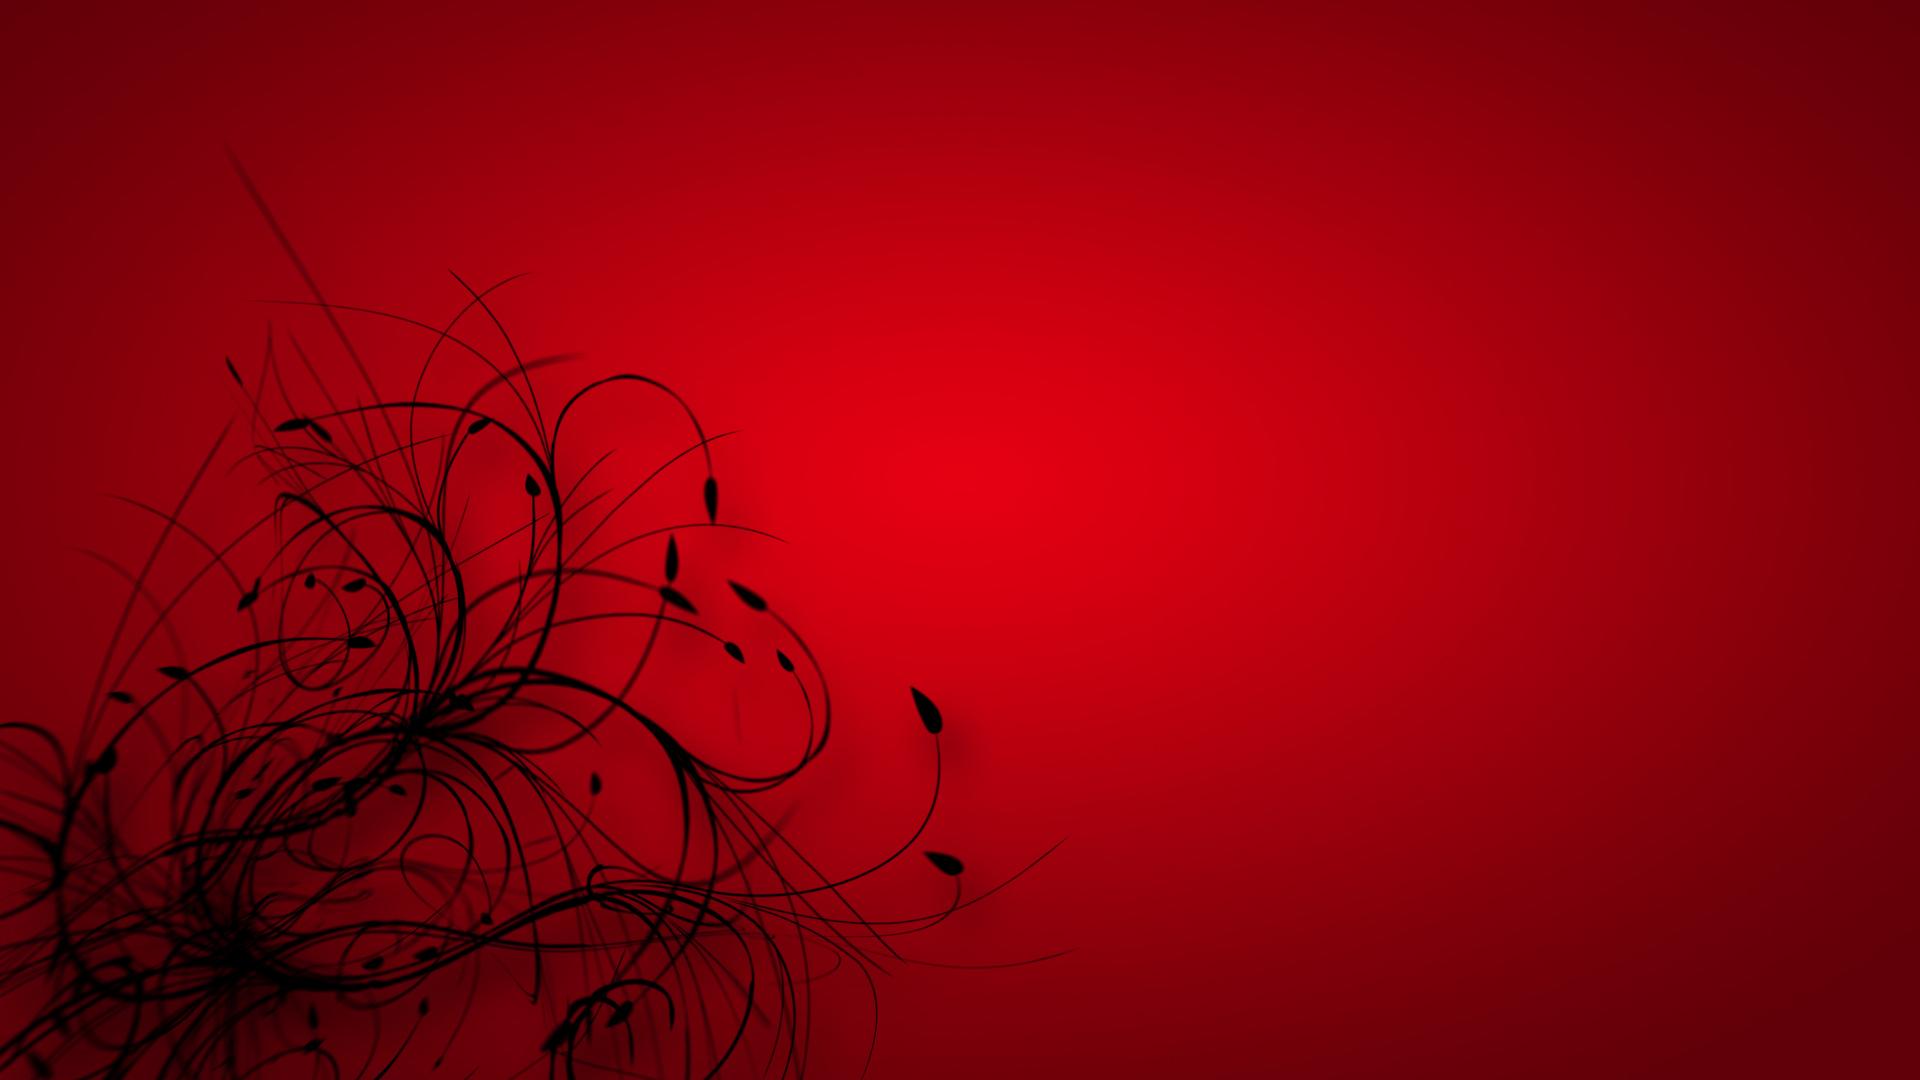 Red Wallpaper HD 1920x1080 ImageBankbiz 1920x1080